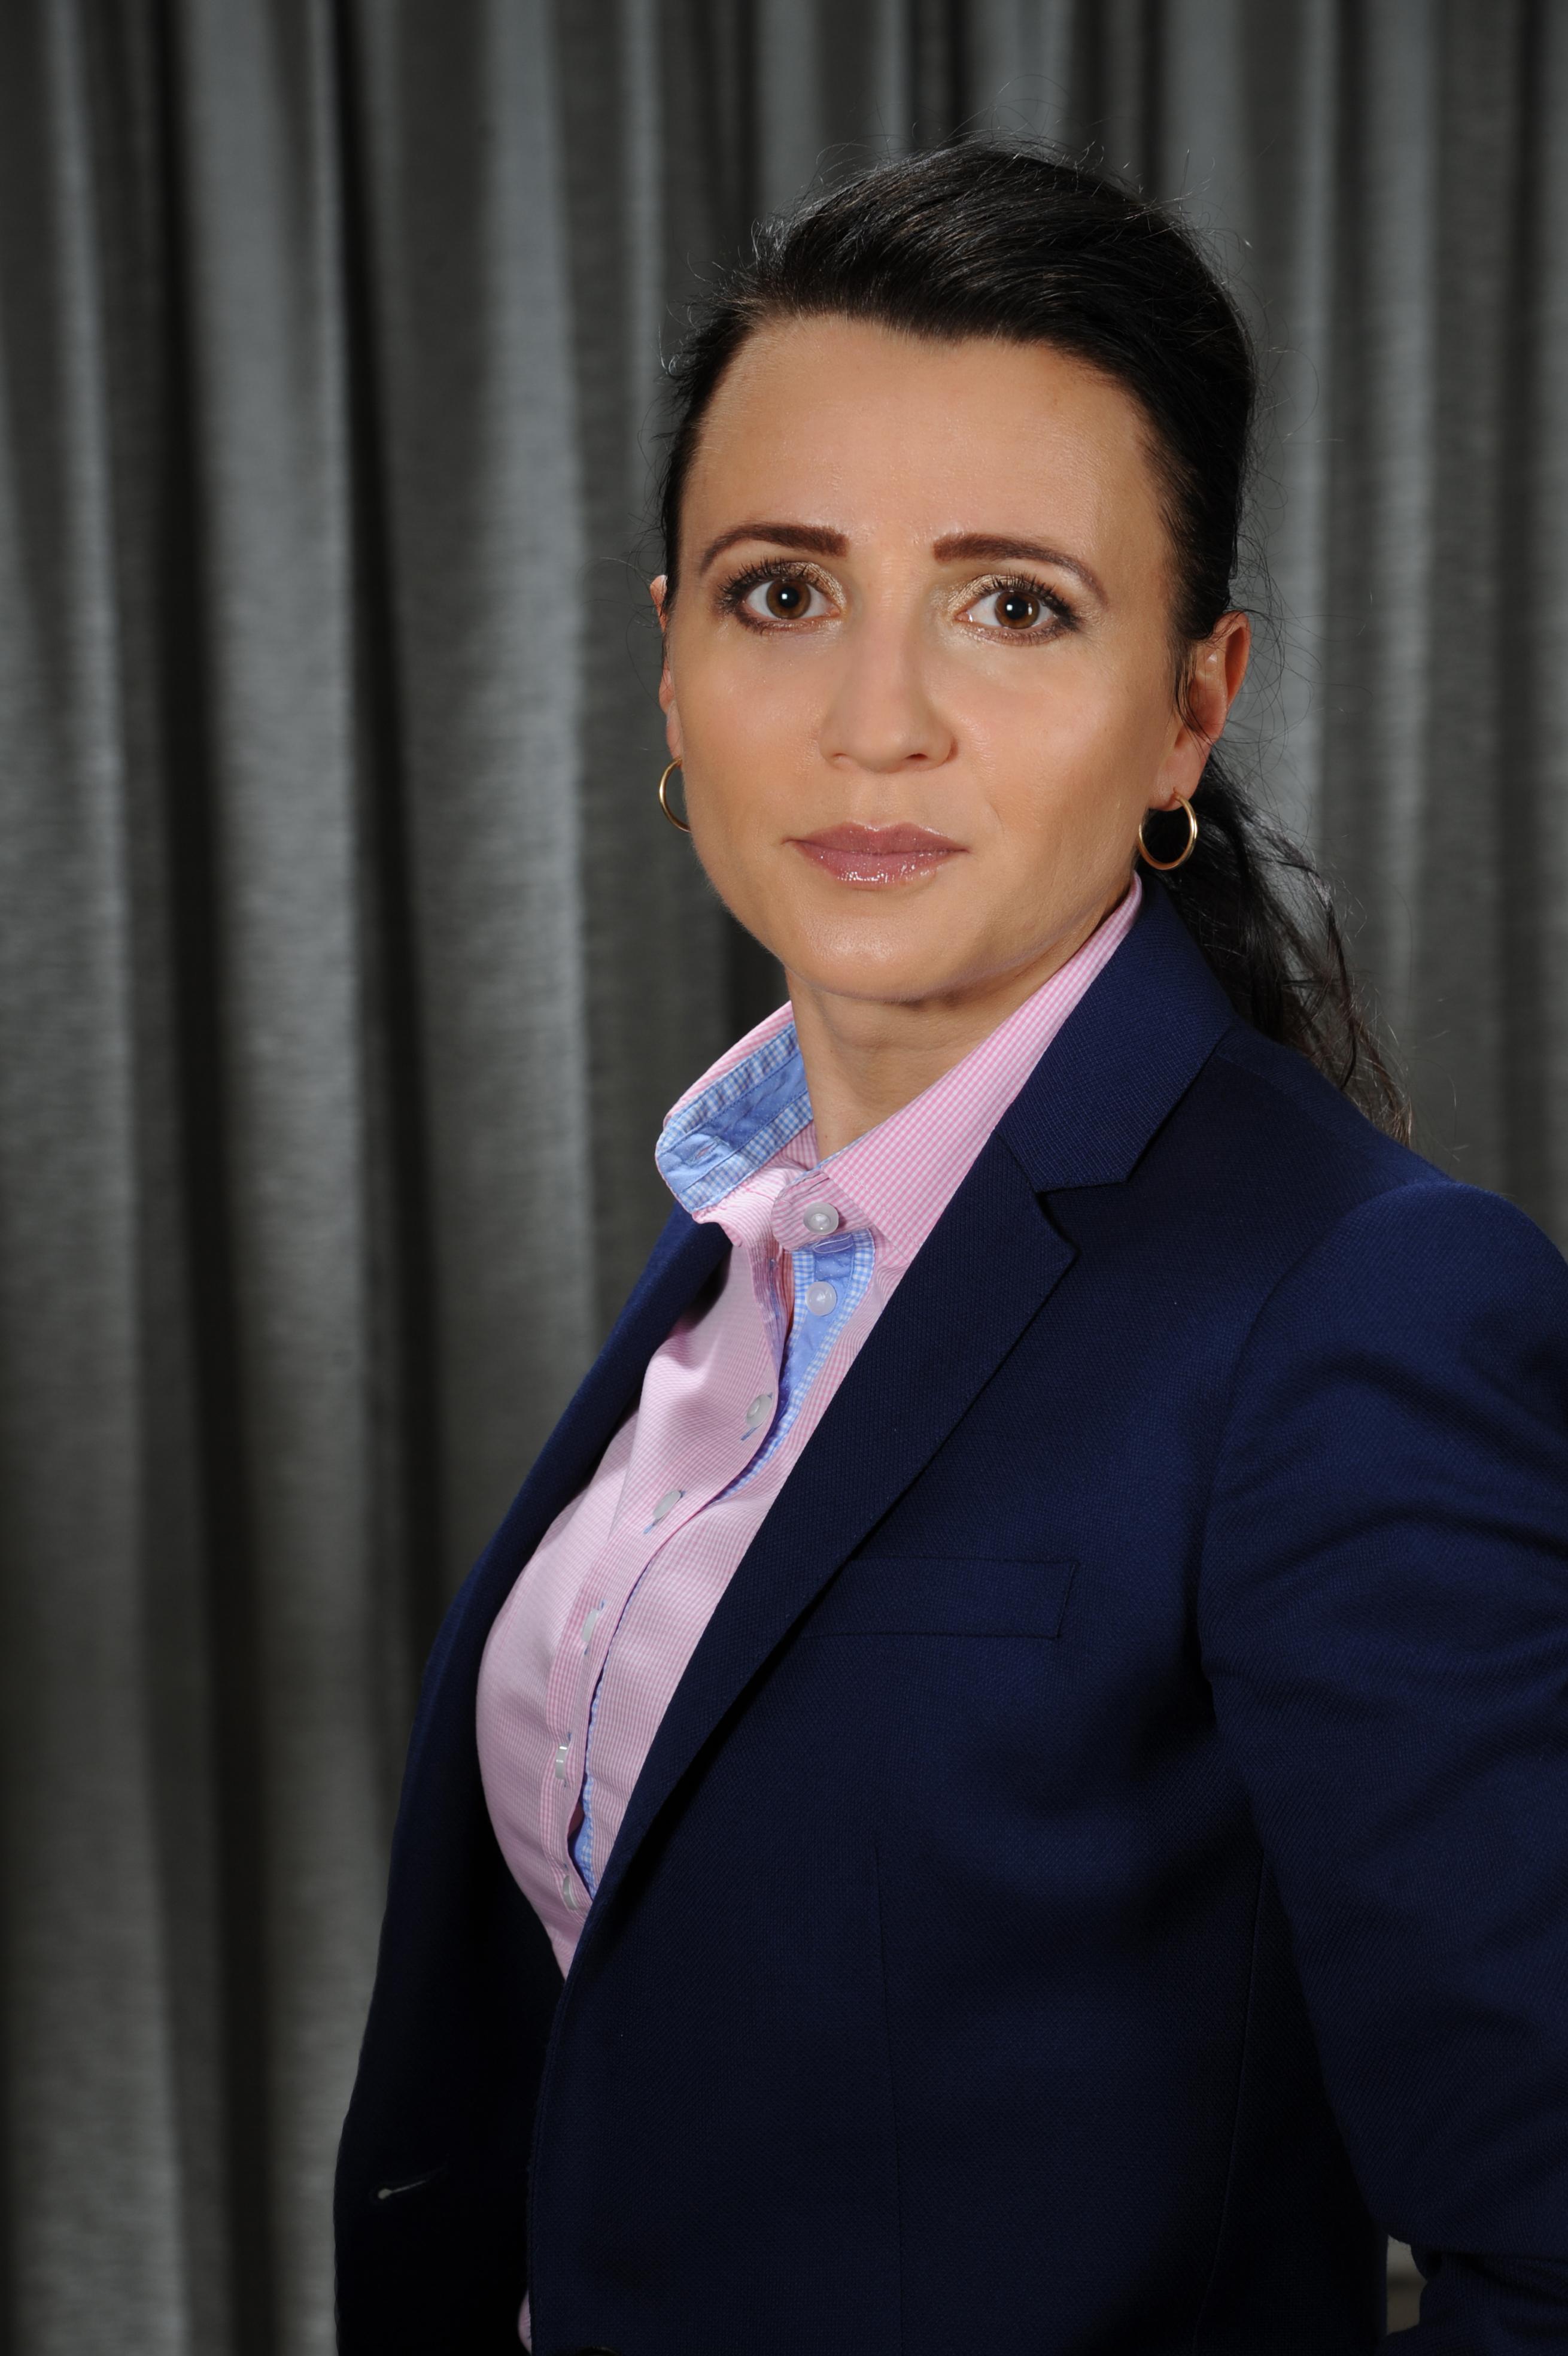 Sabina Stachurek Dyrektor Personalny MAHLE w Polsce